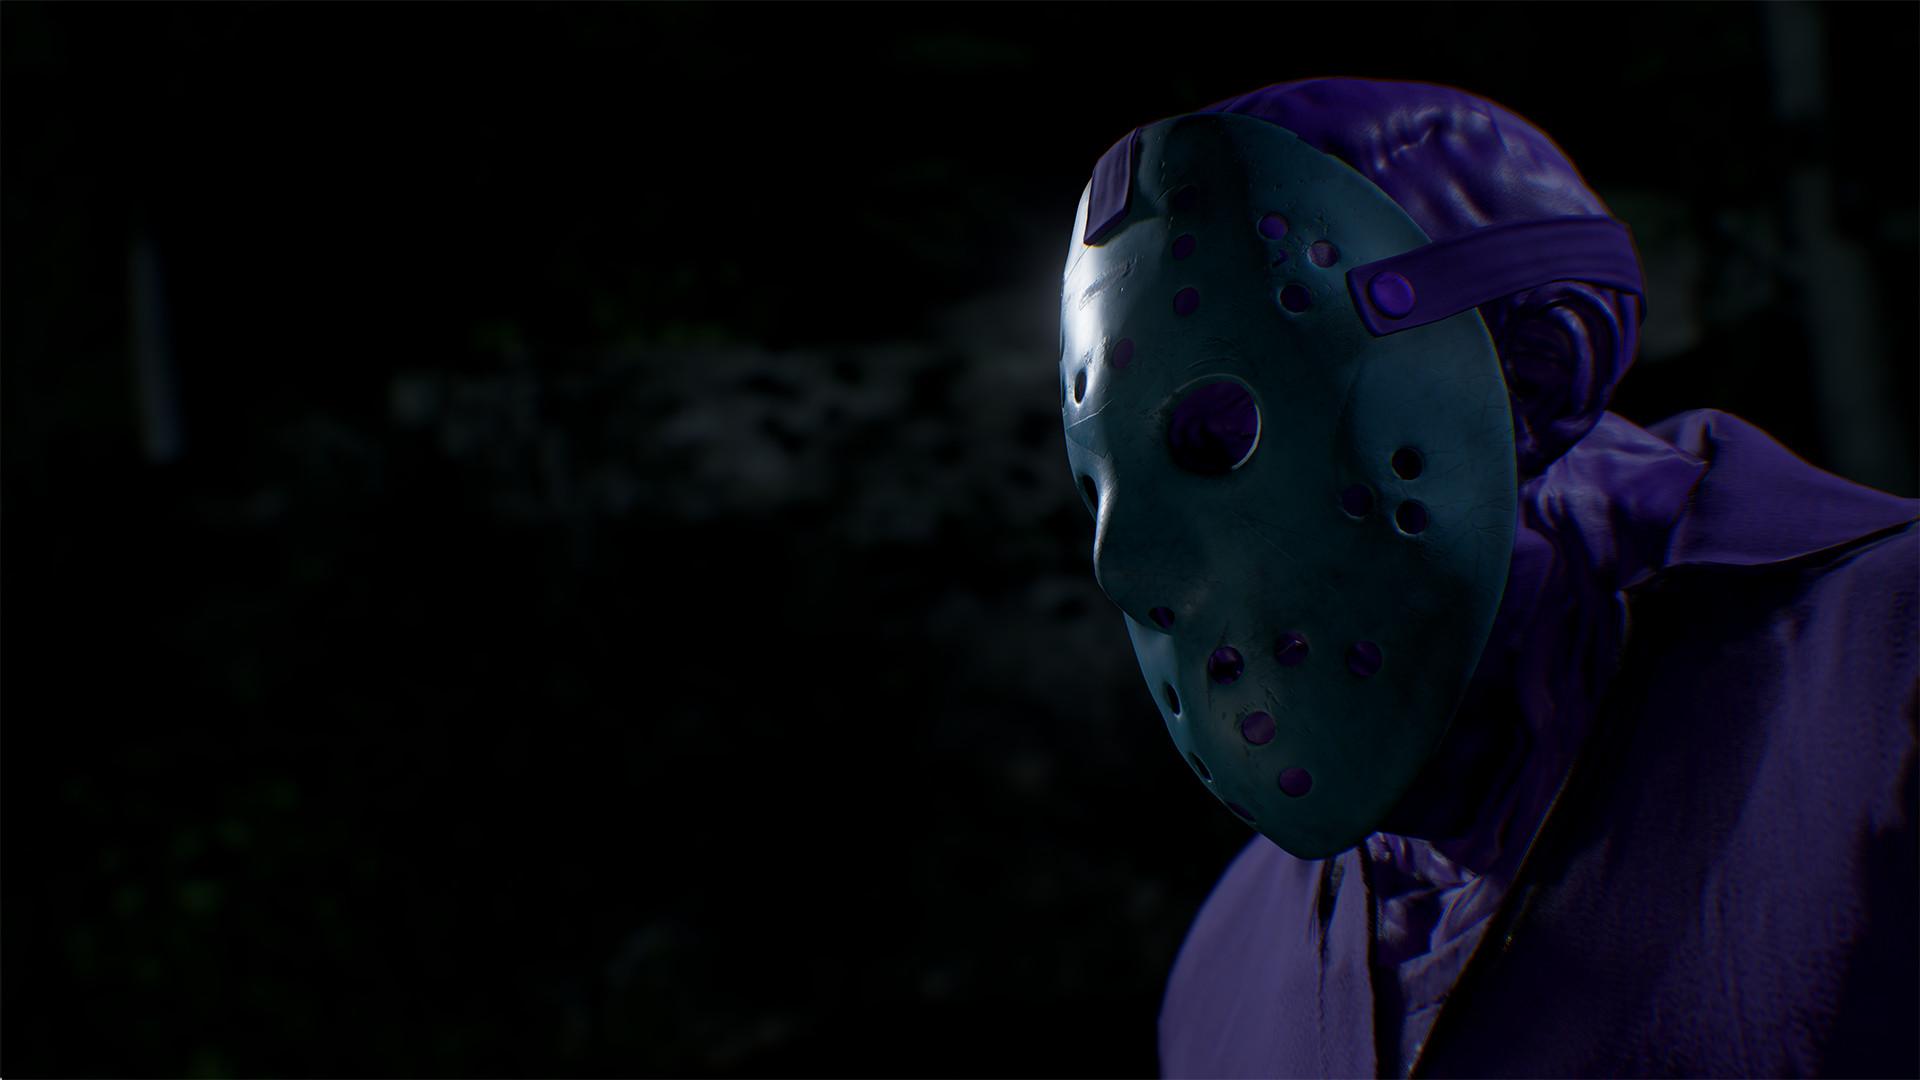 Friday the 13th: Free Bonuses & Retro Jason Skin for All Players Tomorrow –  PlayStation.Blog